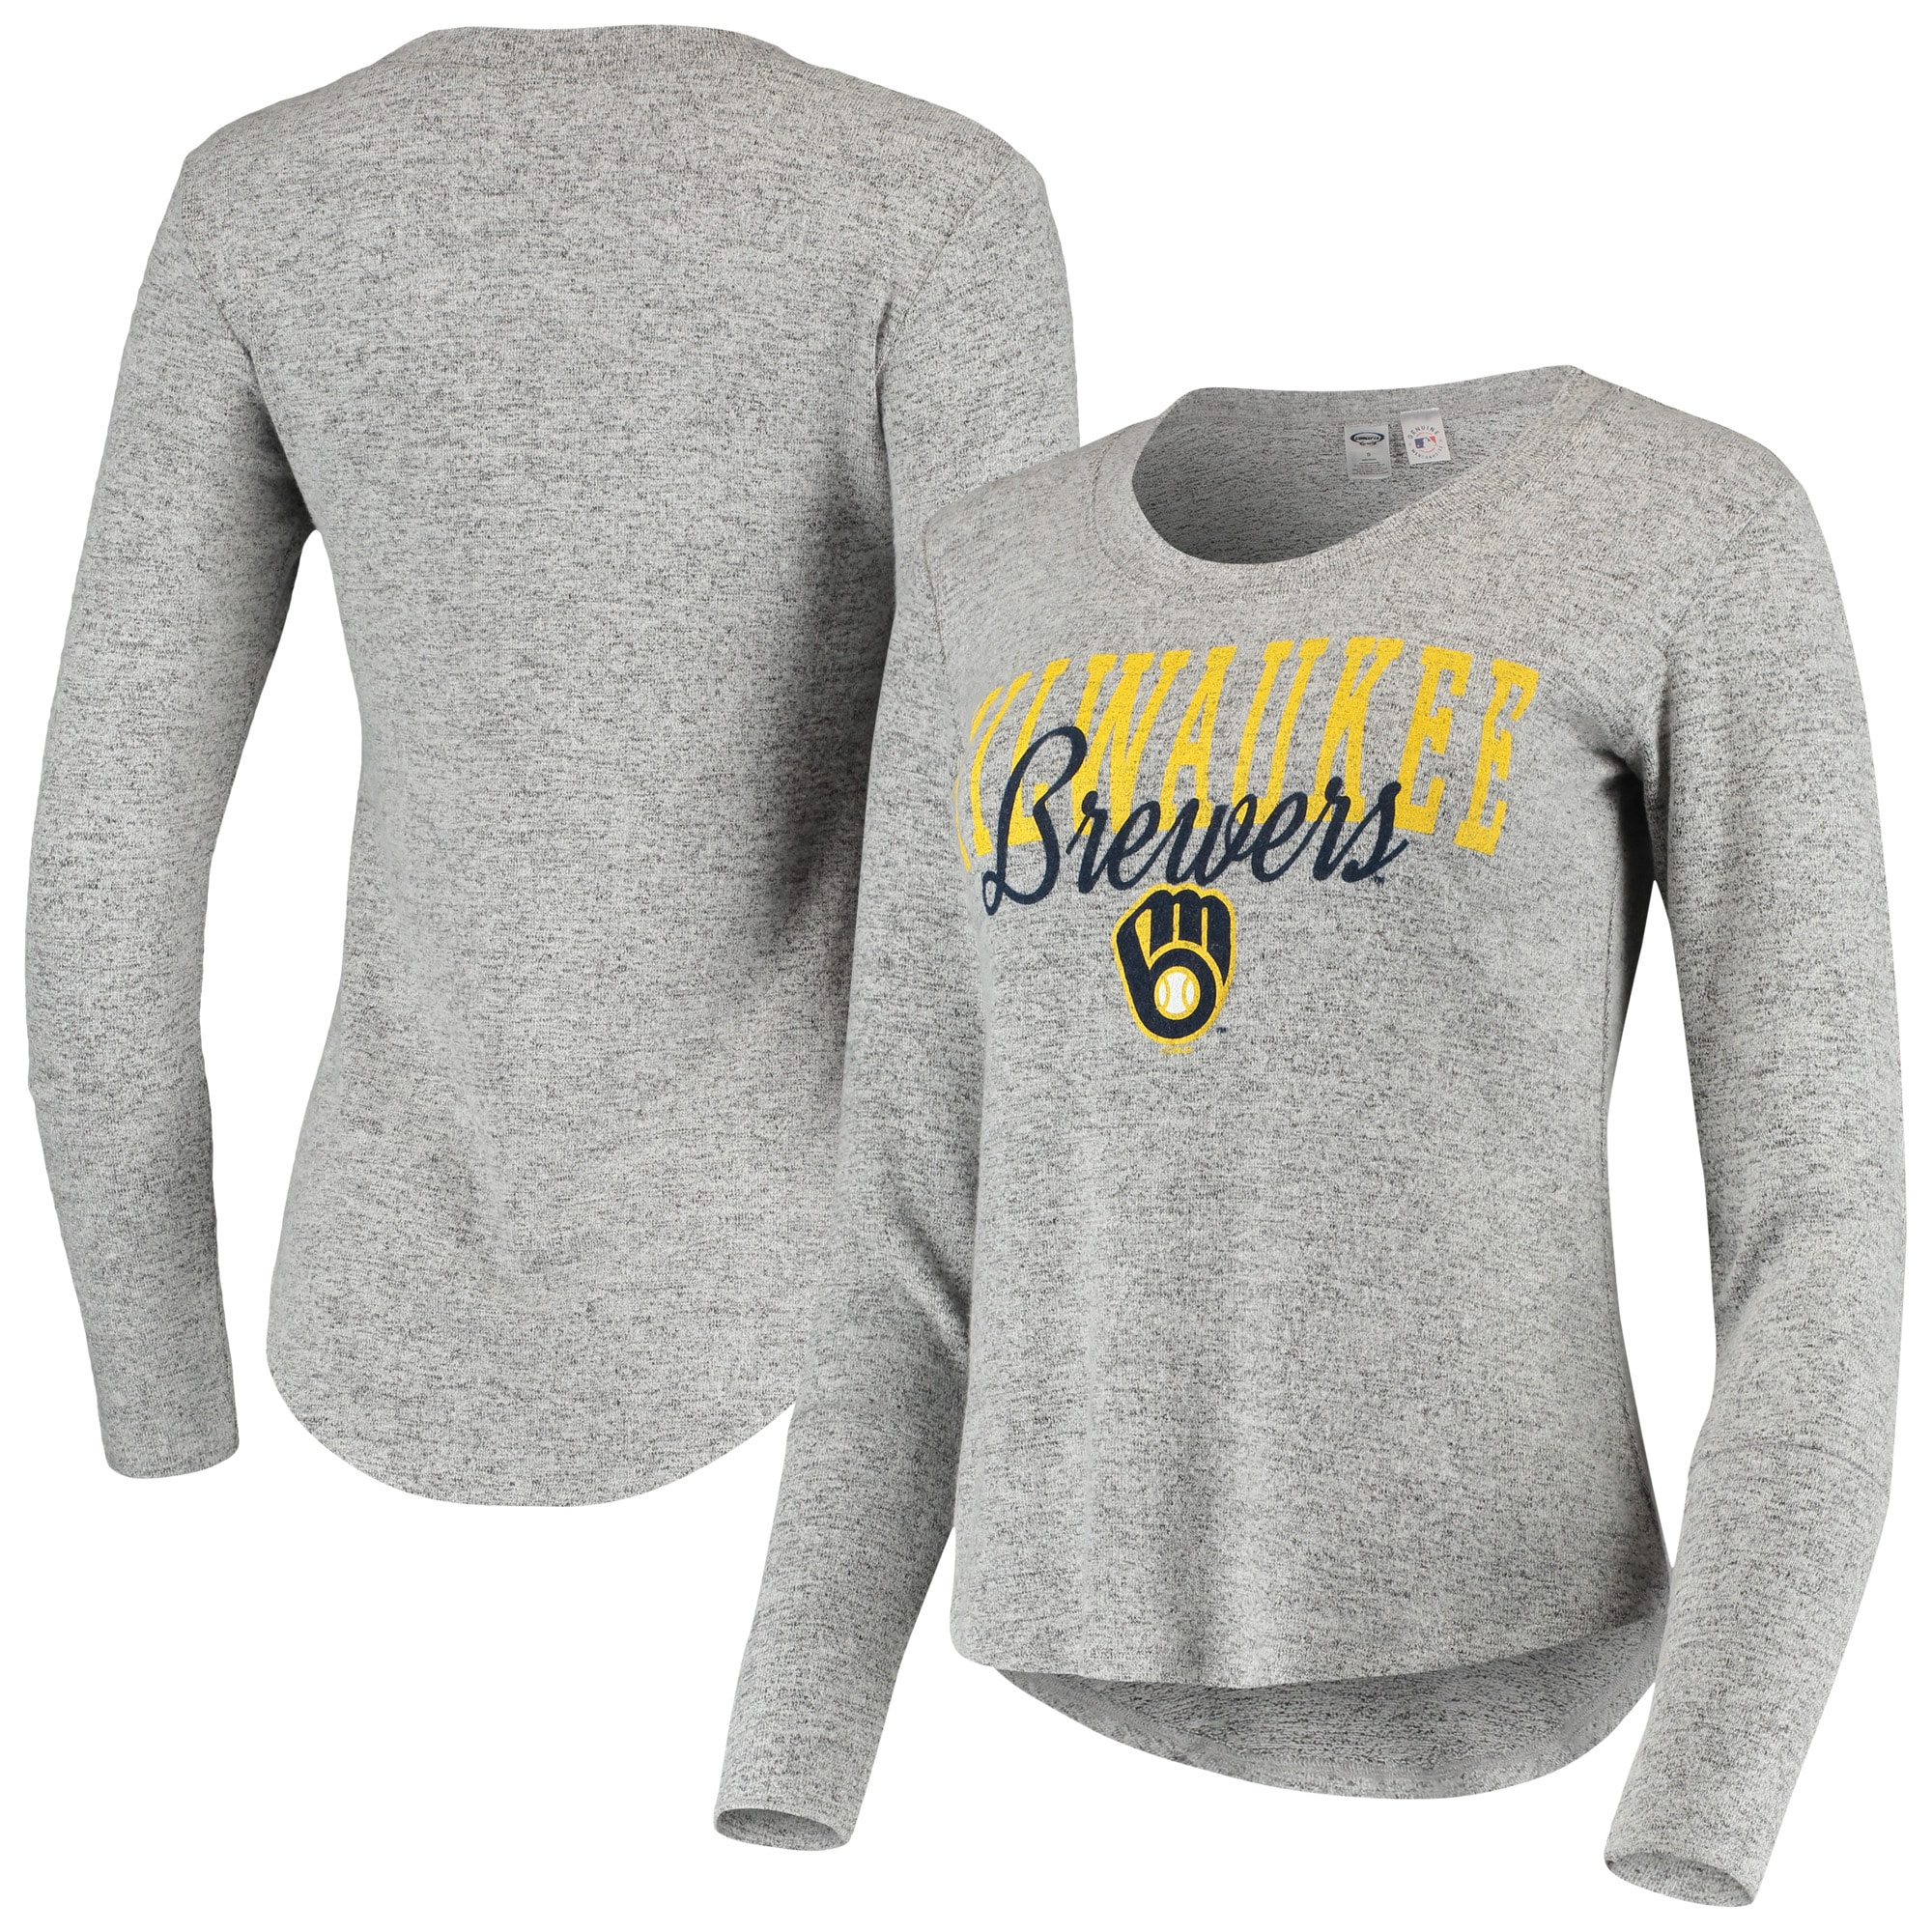 Milwaukee Brewers Concepts Sport Women's Tri-Blend Long Sleeve T-Shirt - Heathered Gray